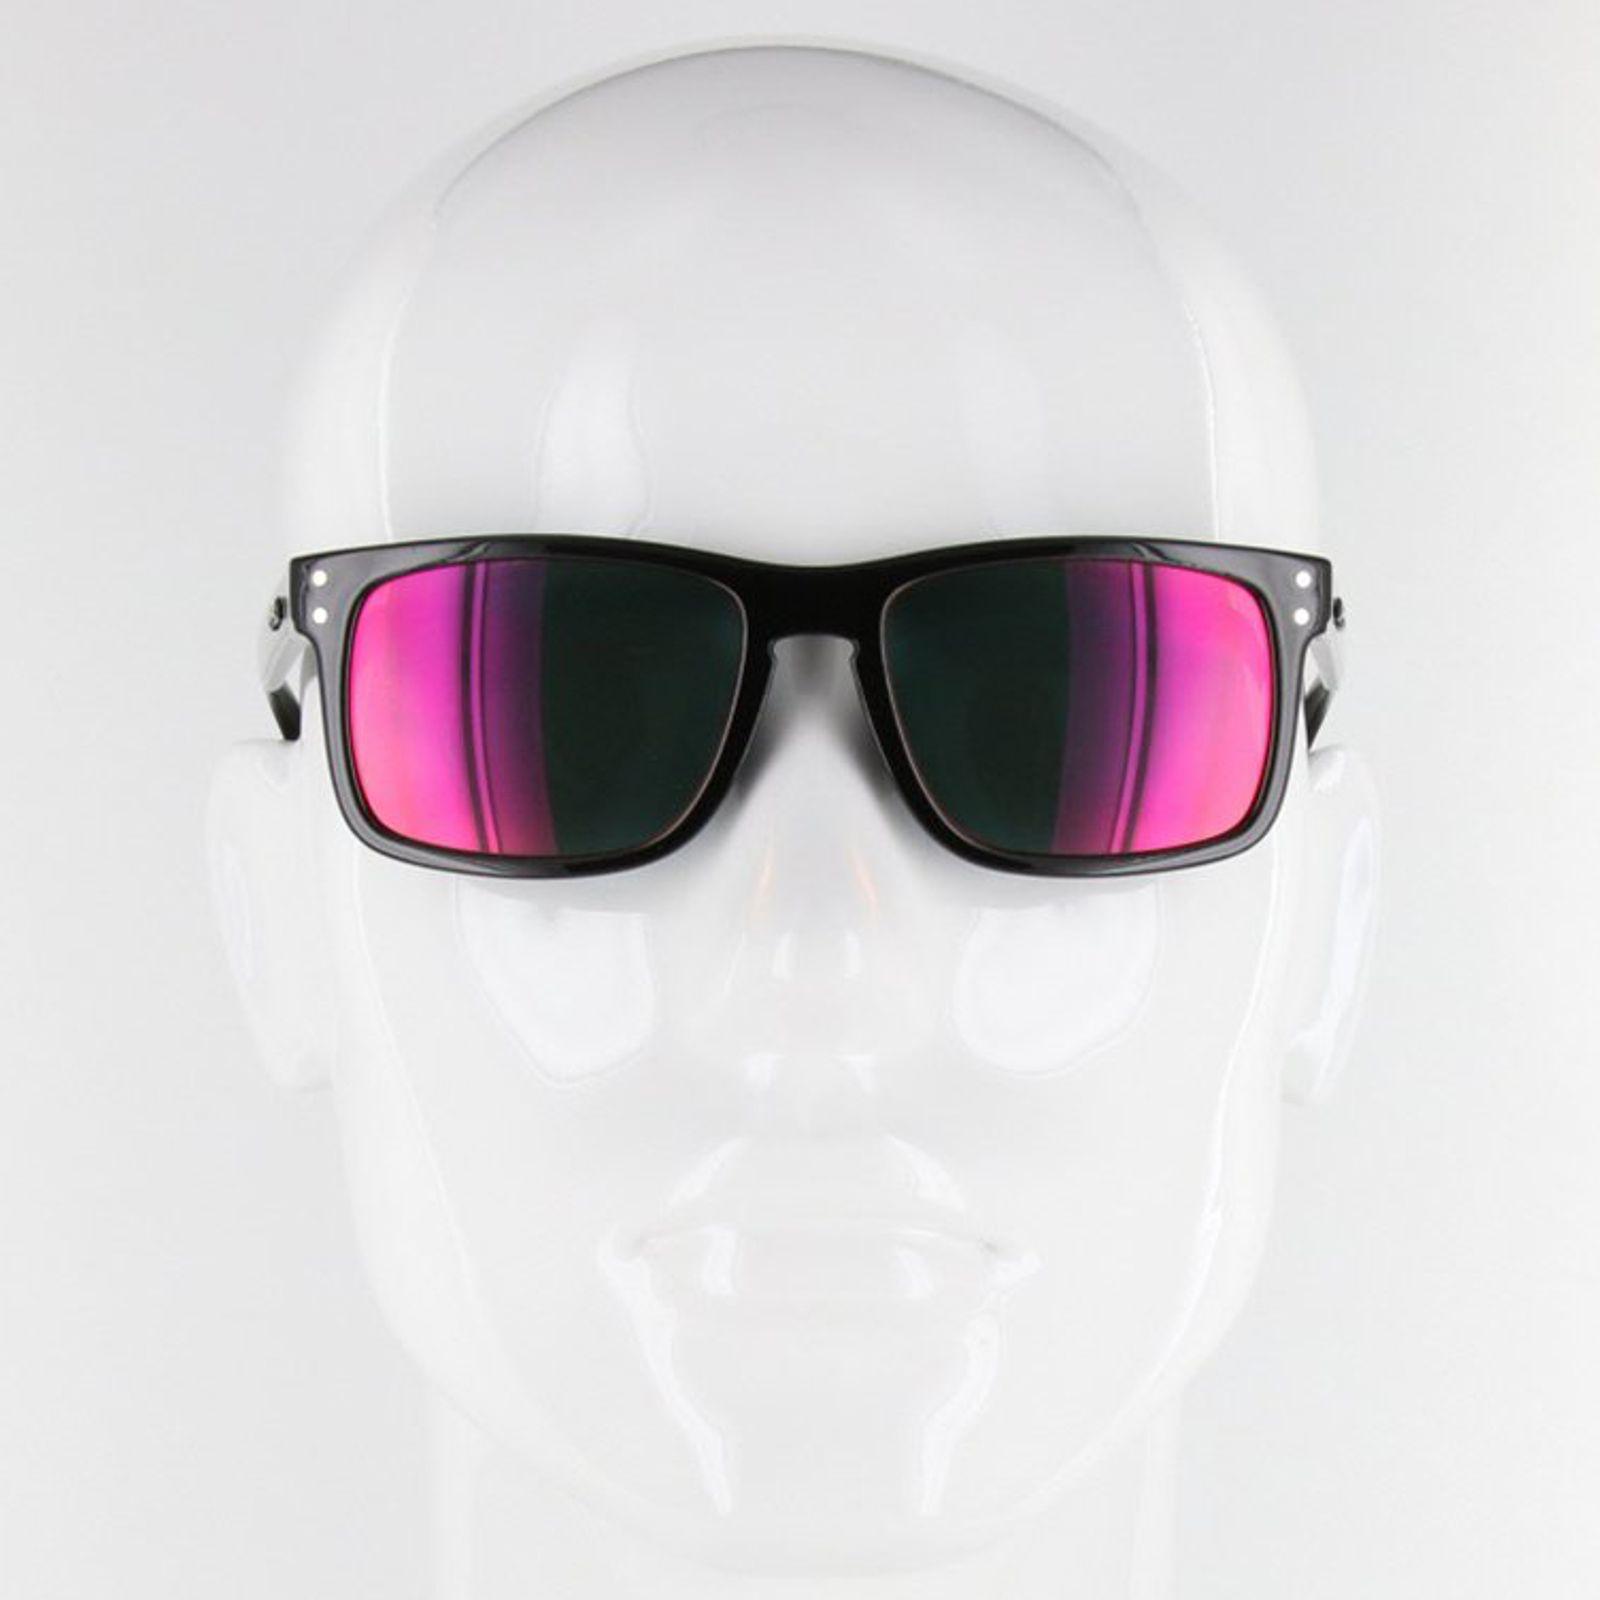 Flaka Funsport   CARVE Sonnenbrille Goblin Schwarz Rot   Sonnenbrillen